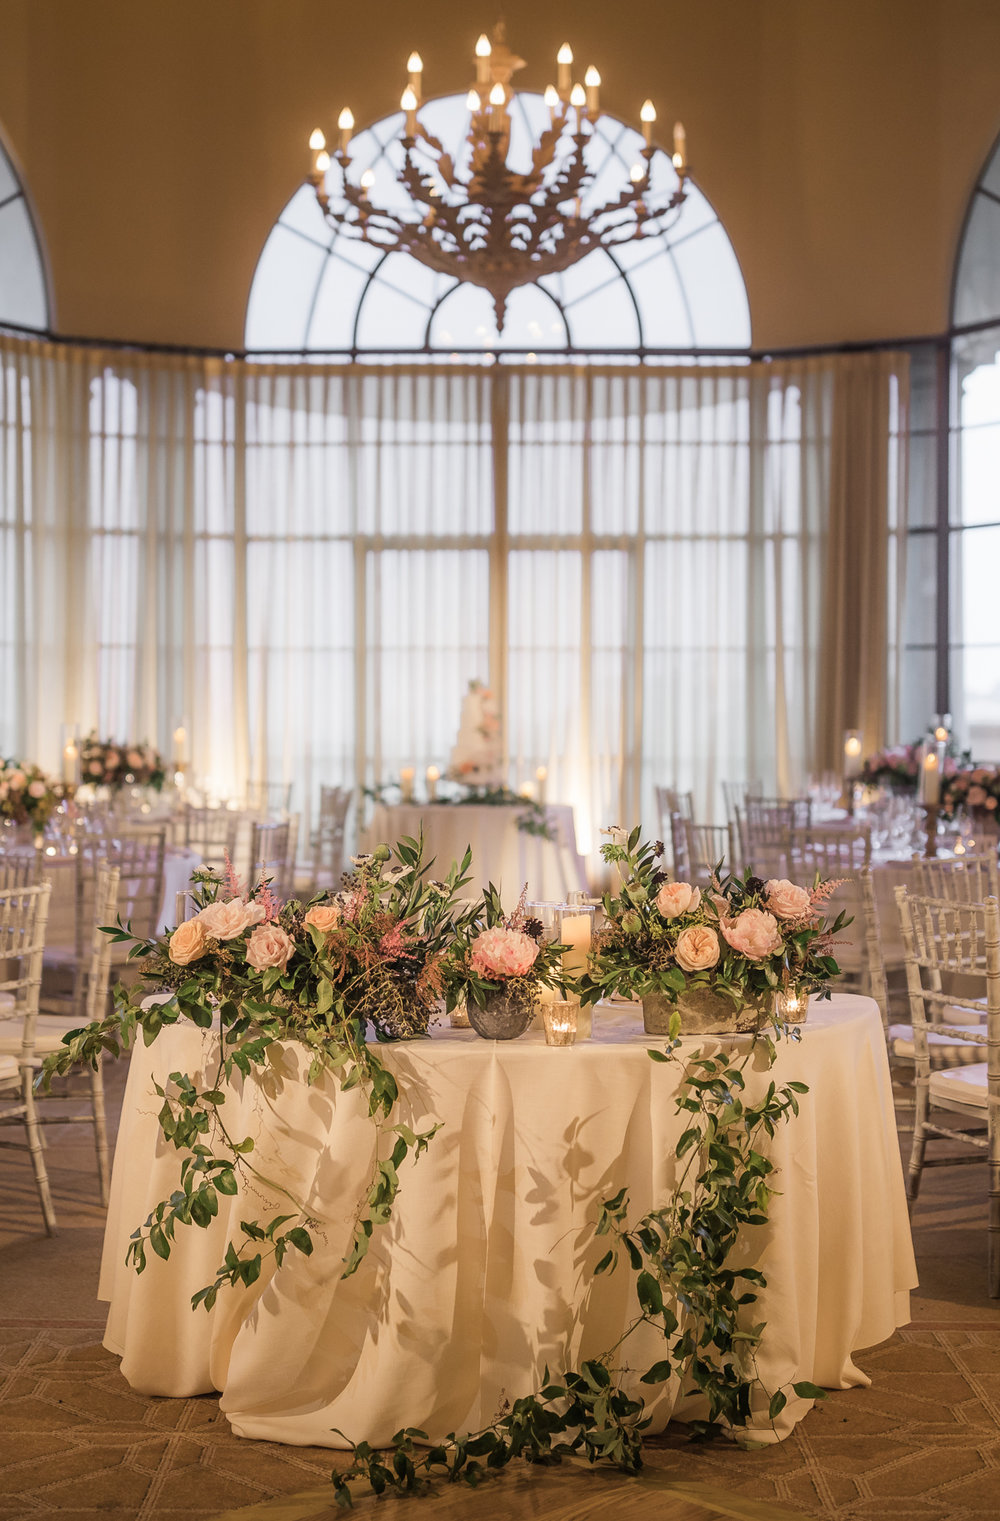 Real-Wedding-Pelican-Hill-Shawna-Yamamoto-LinandJirsa-Photography_1718.jpg